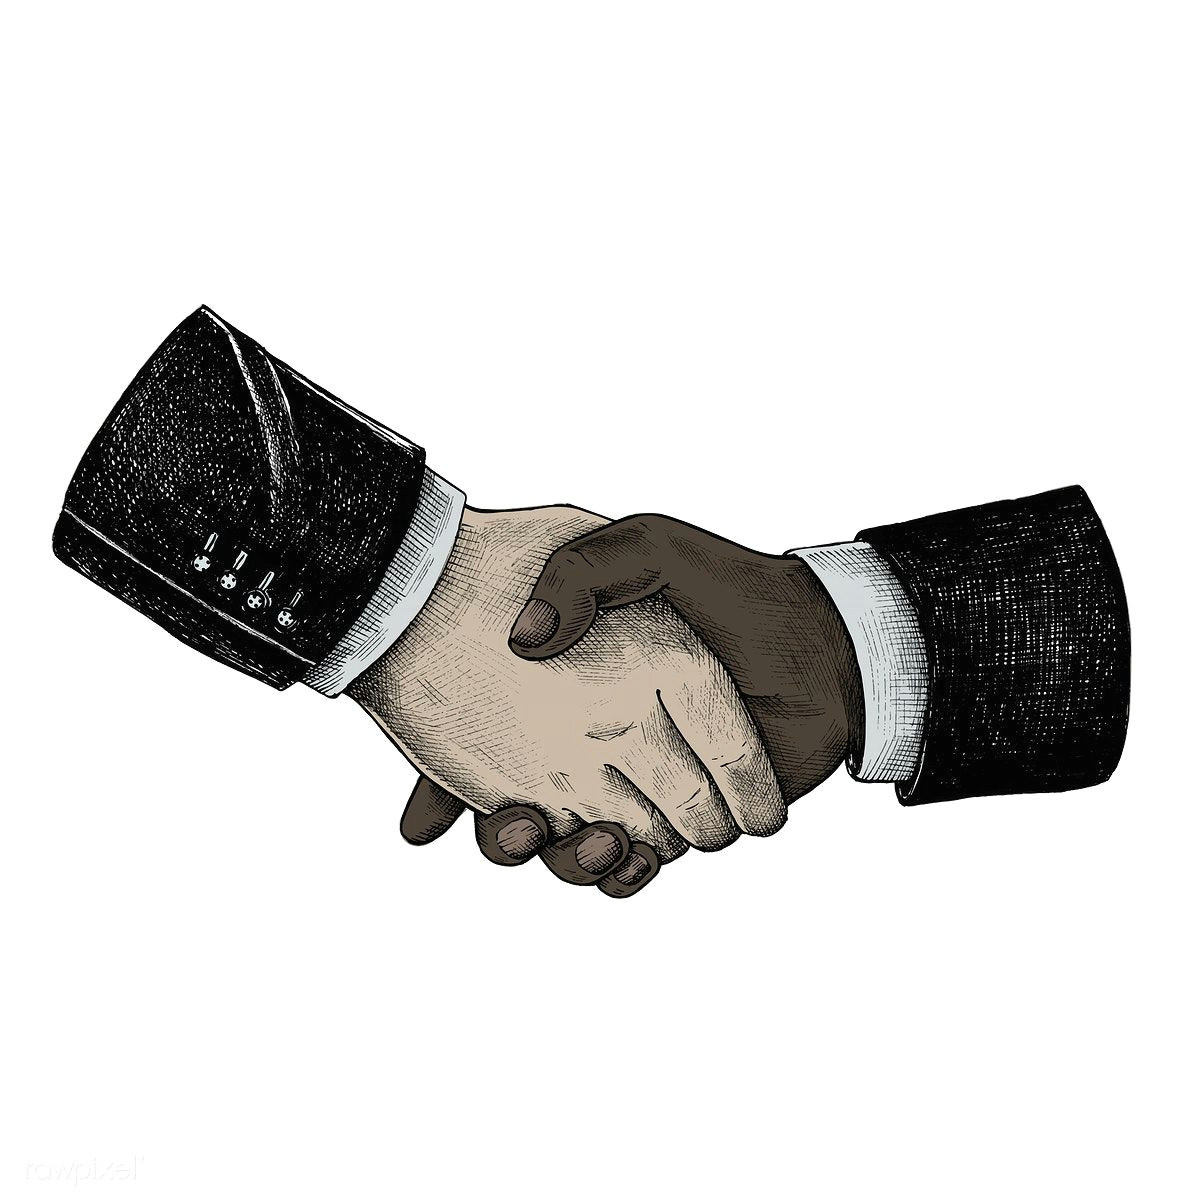 hand drawn international business handshake premium image by rawpixel com how to draw hands